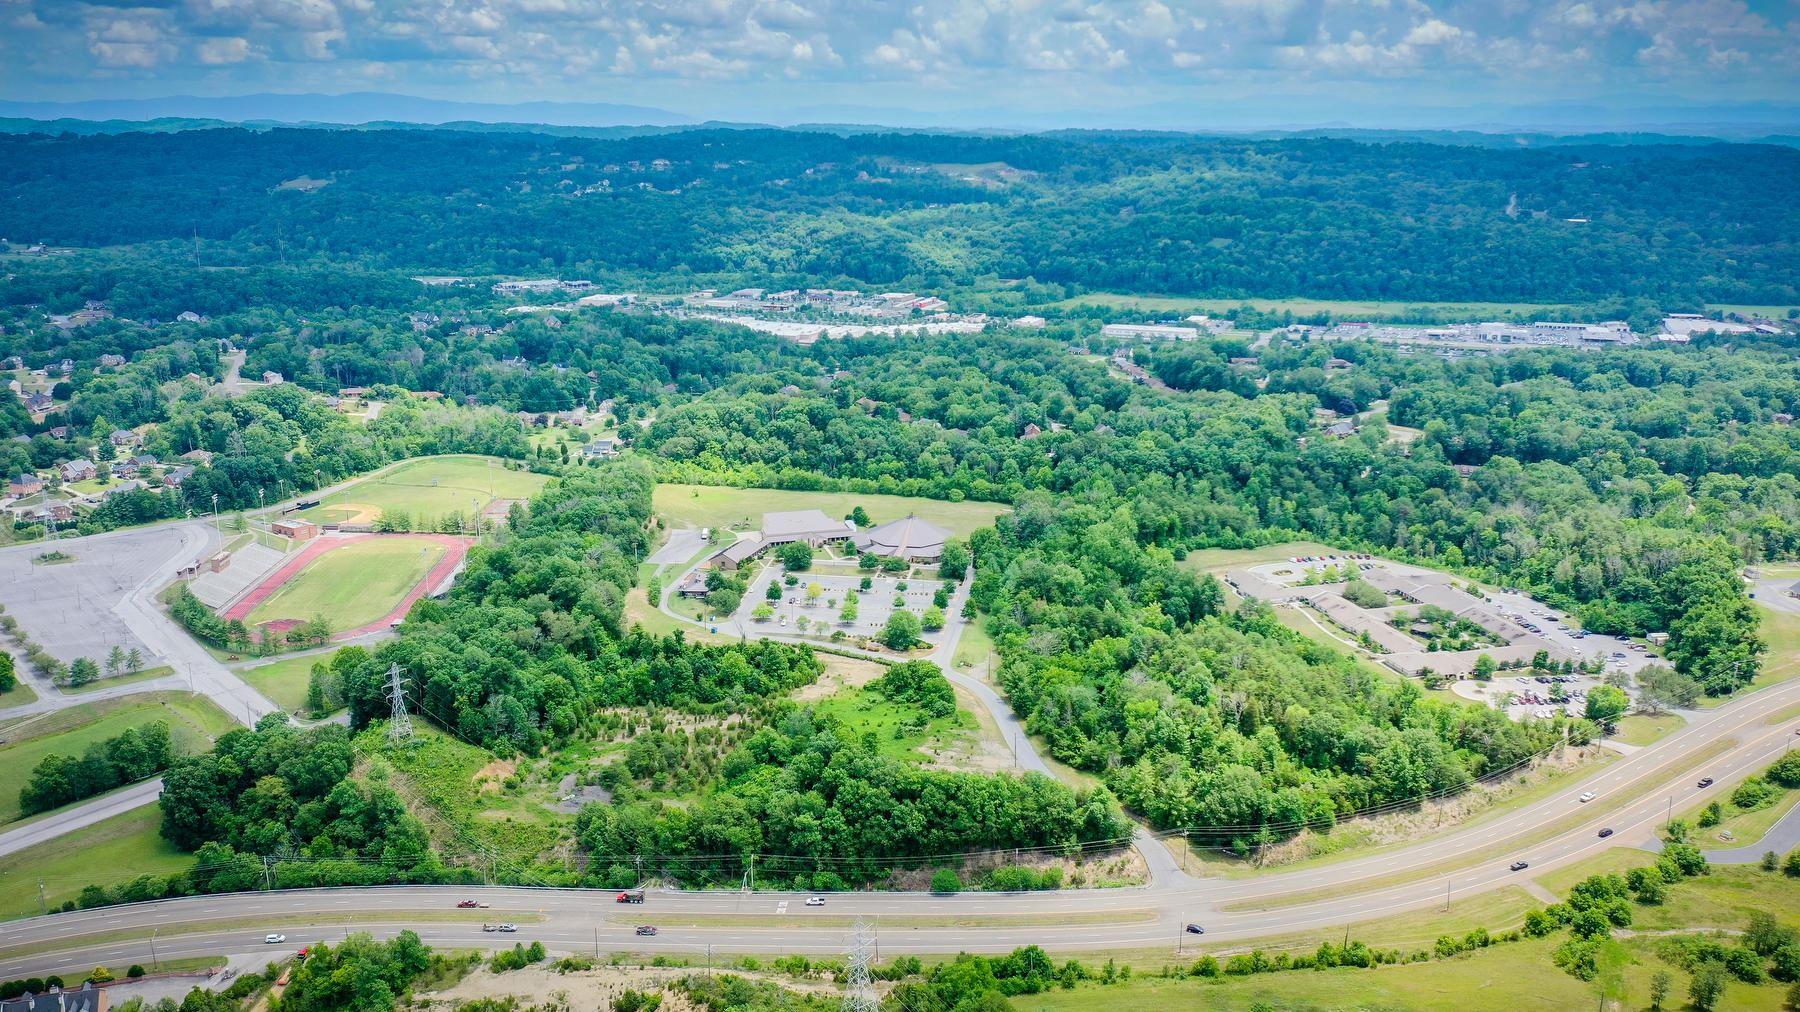 Photo of 0 North John B Dennis Highway, Kingsport, TN 37660 (MLS # 9925537)